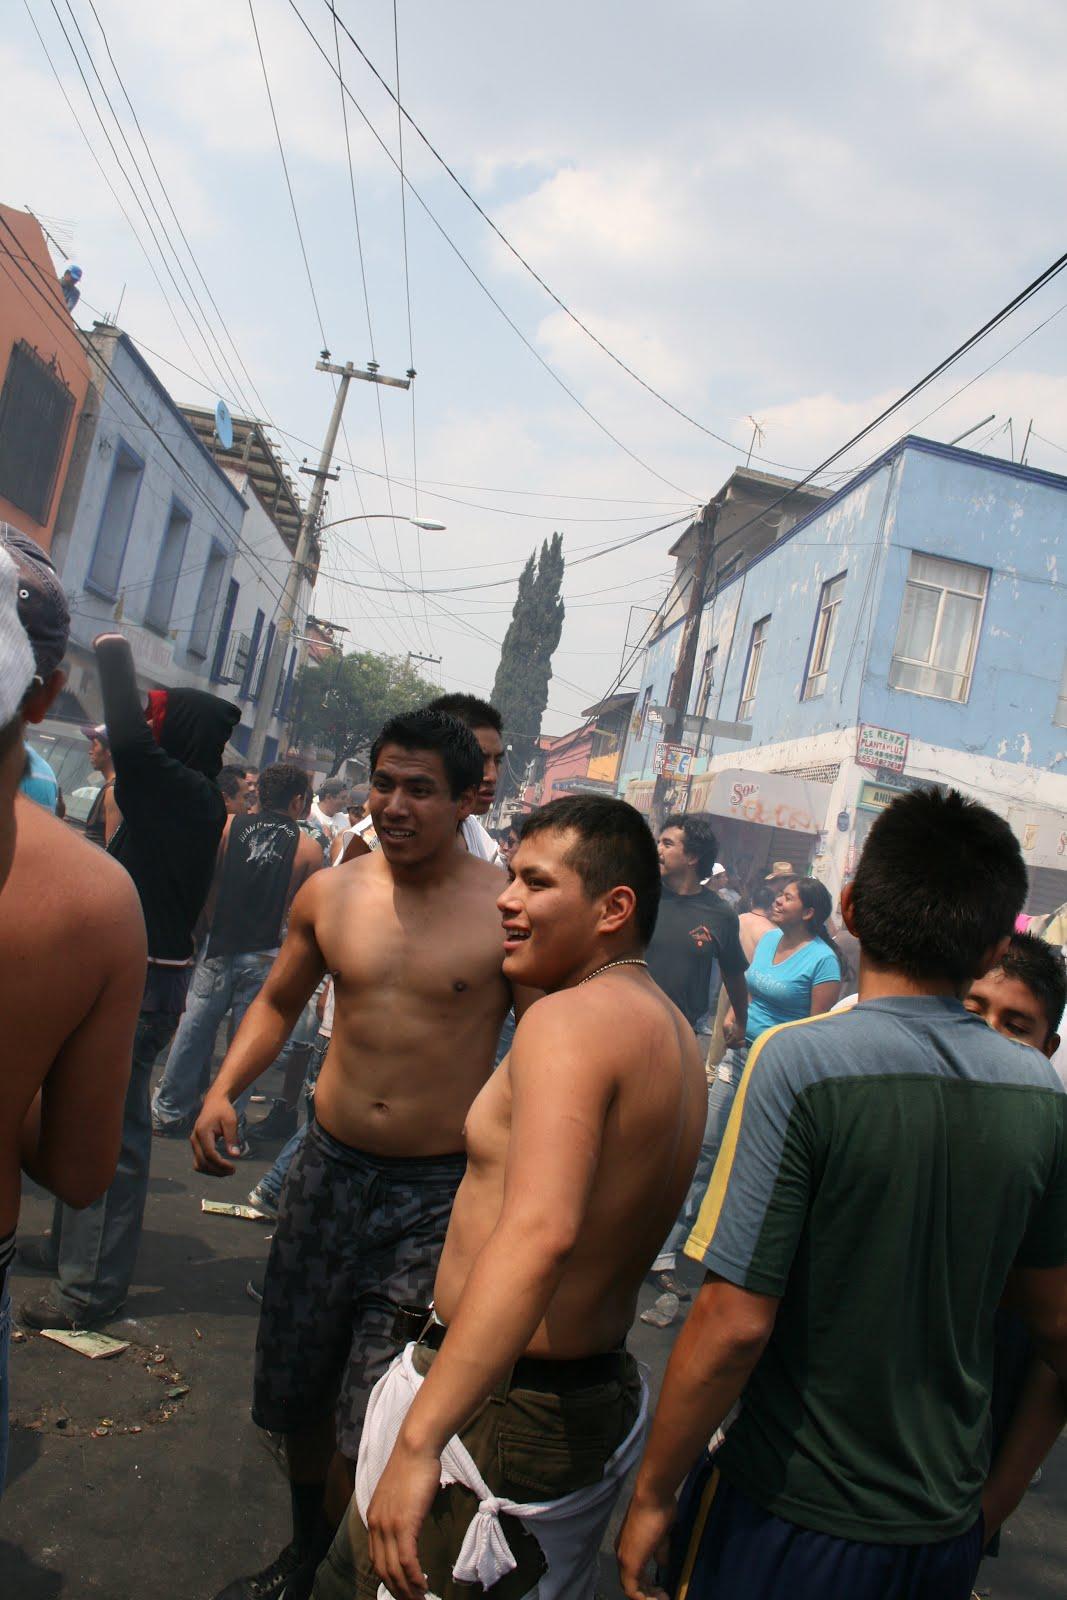 Desnudos en las calles de mexico - 2 8